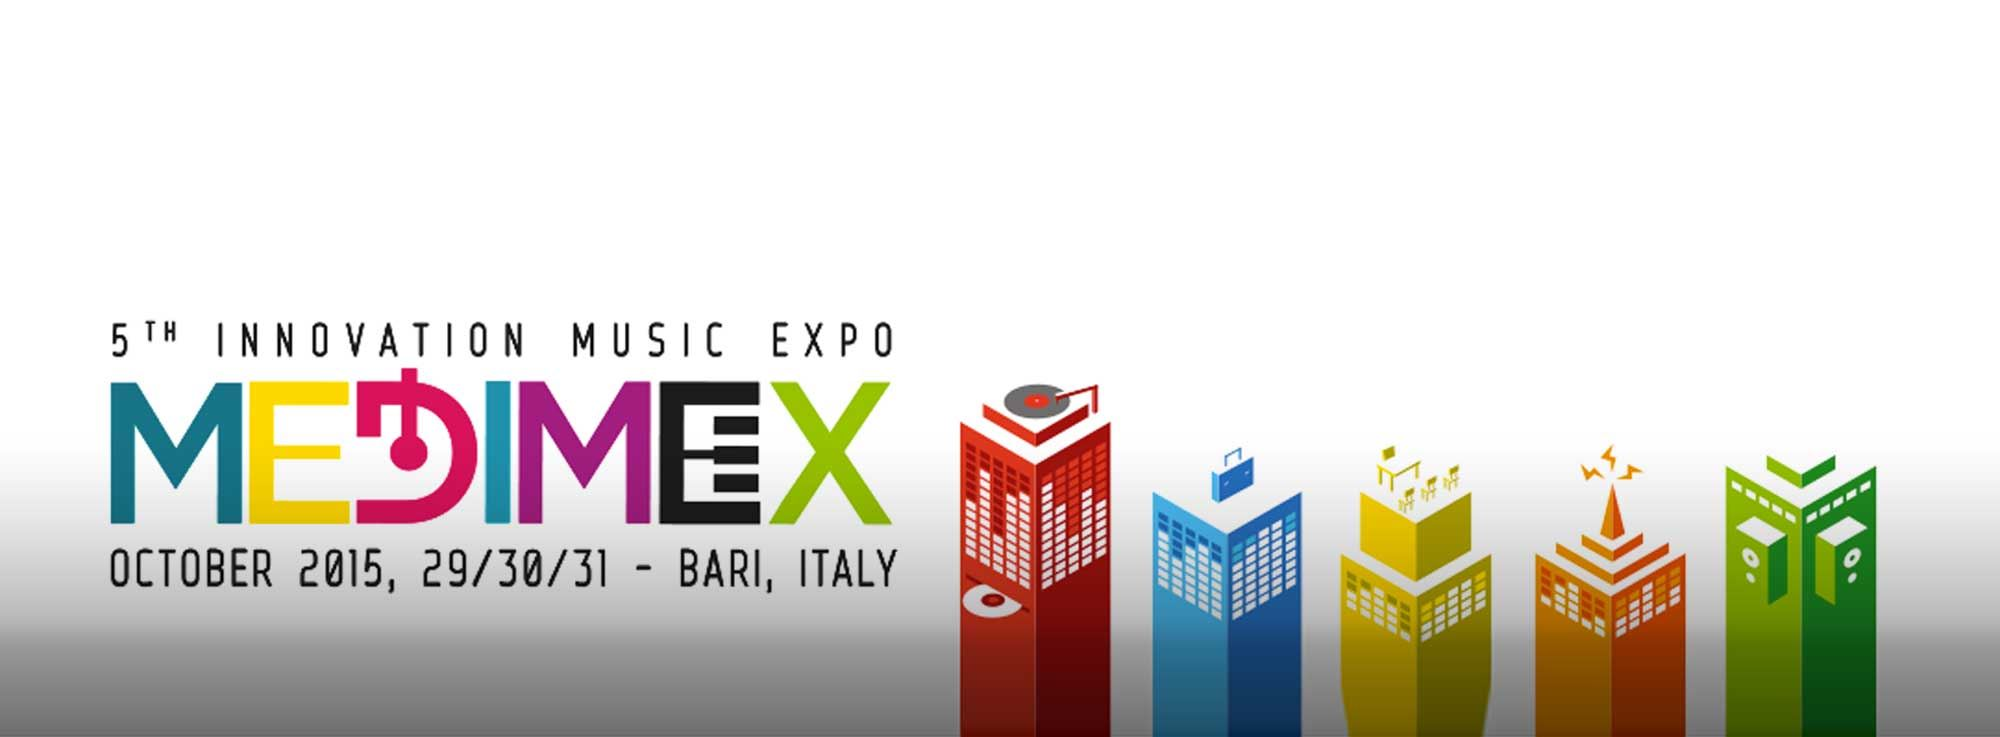 Bari: Medimex 2015